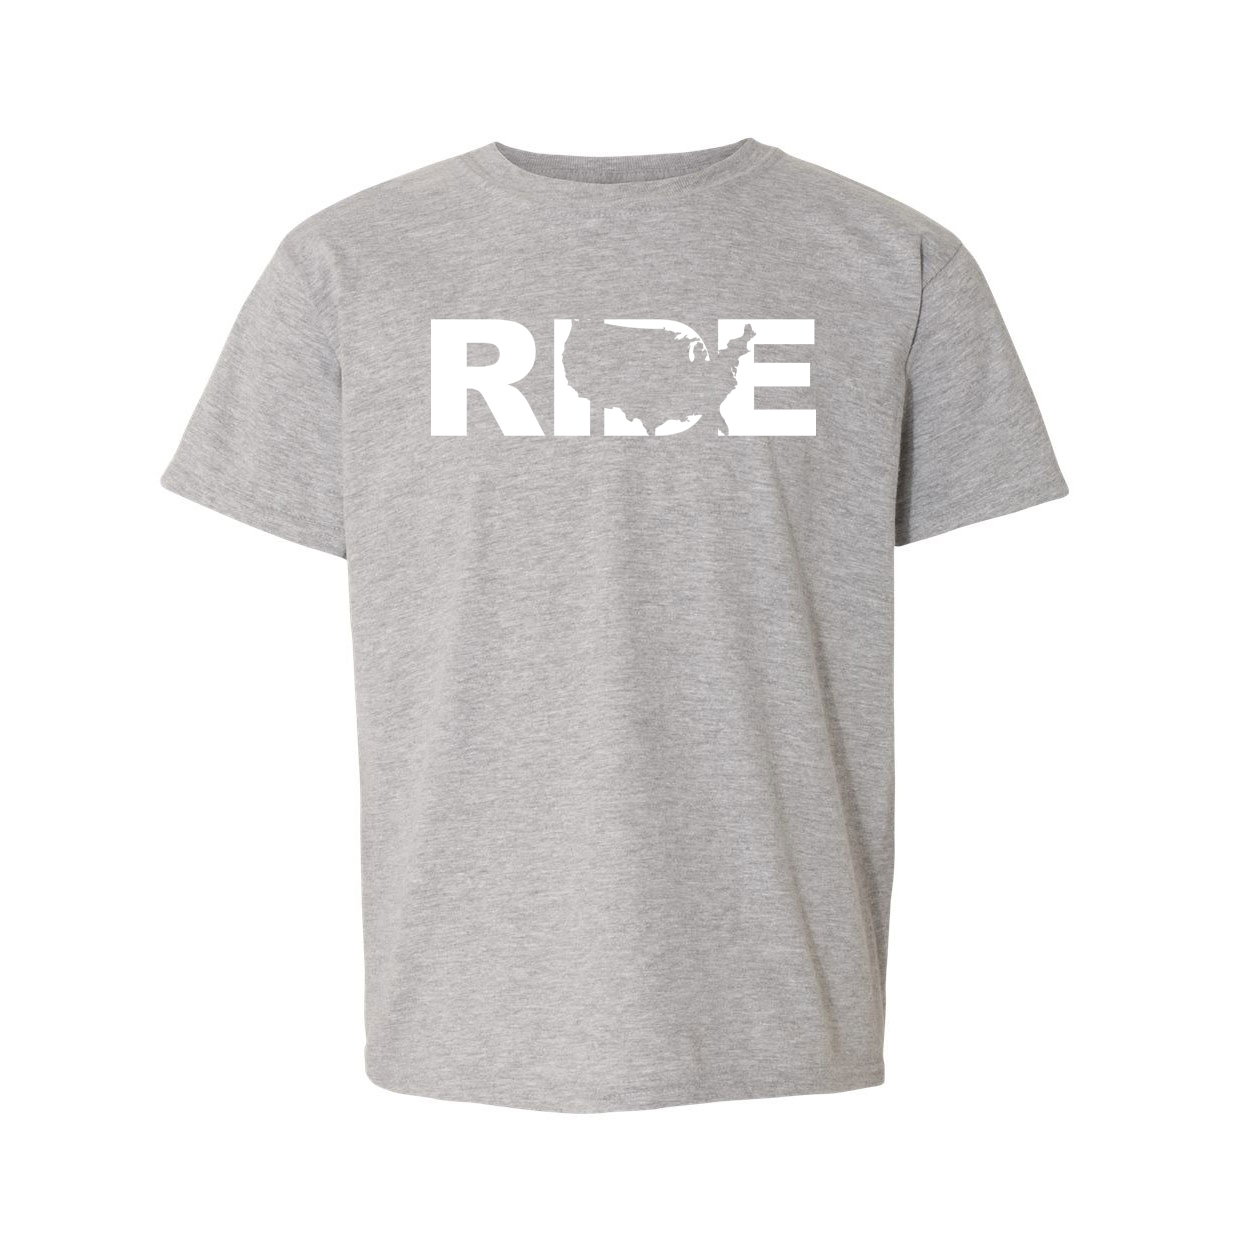 Ride United States Classic Youth T-Shirt Gray (White Logo)